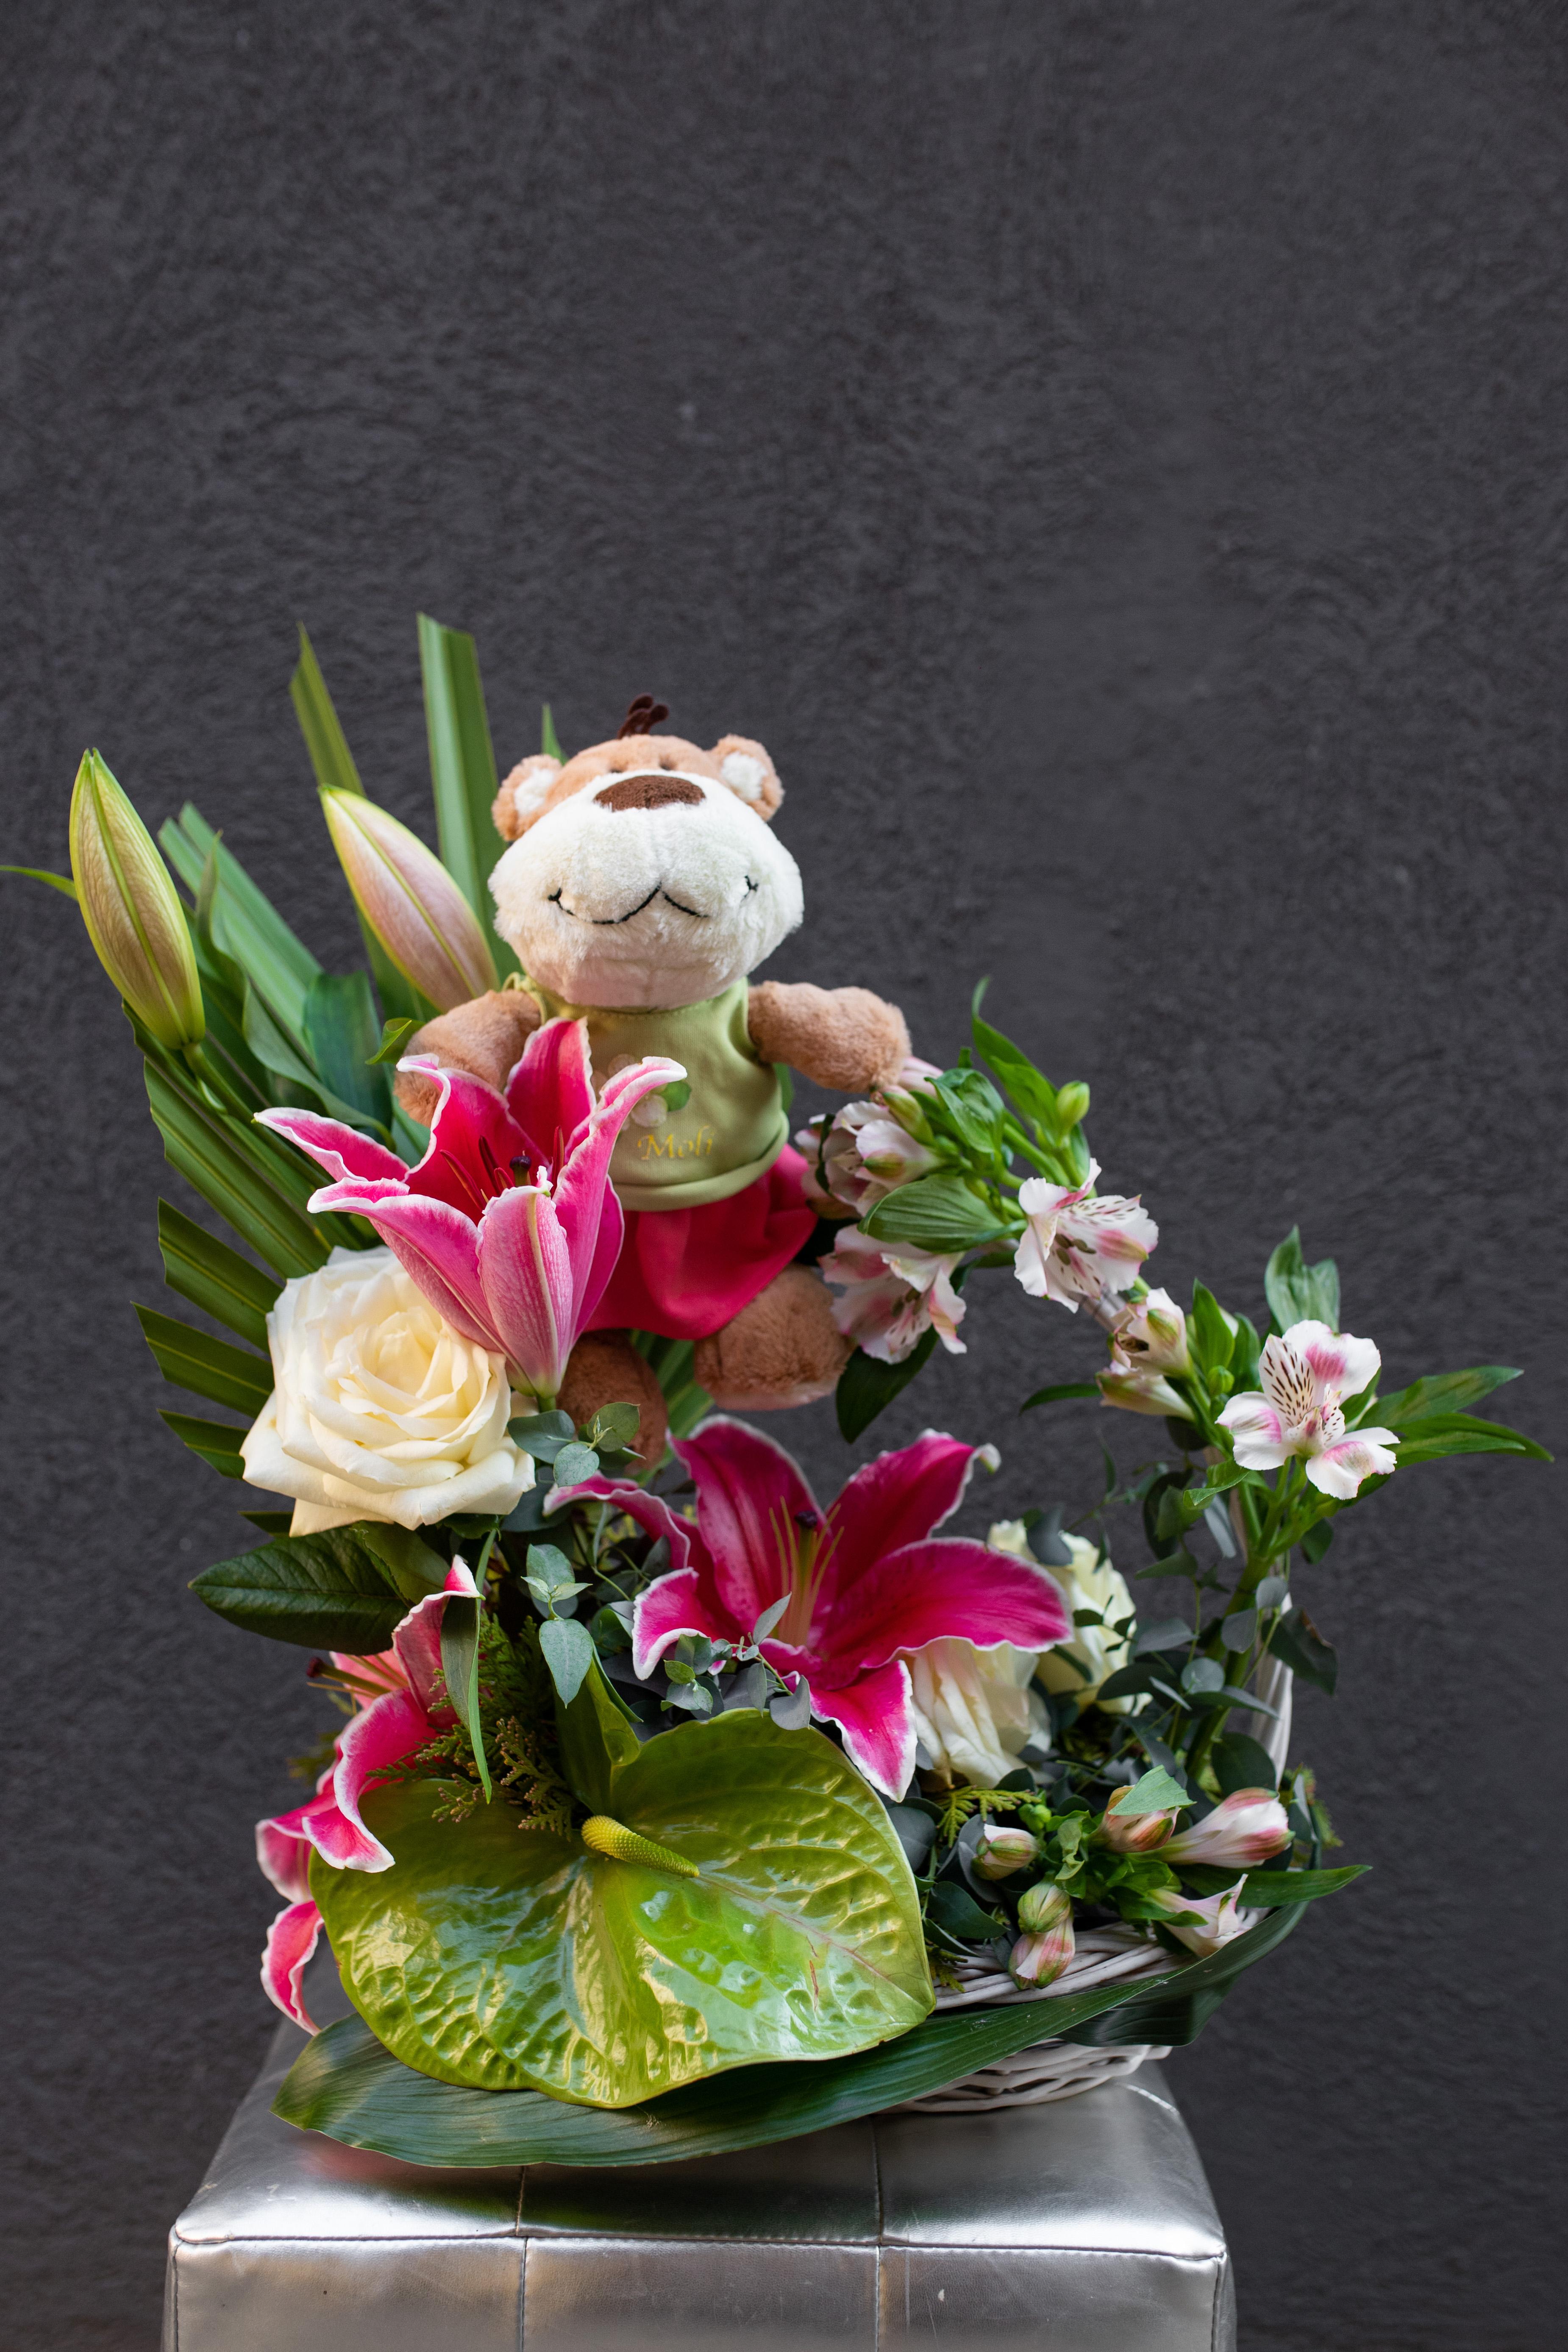 Cvetni aranžman sa plišanim medom